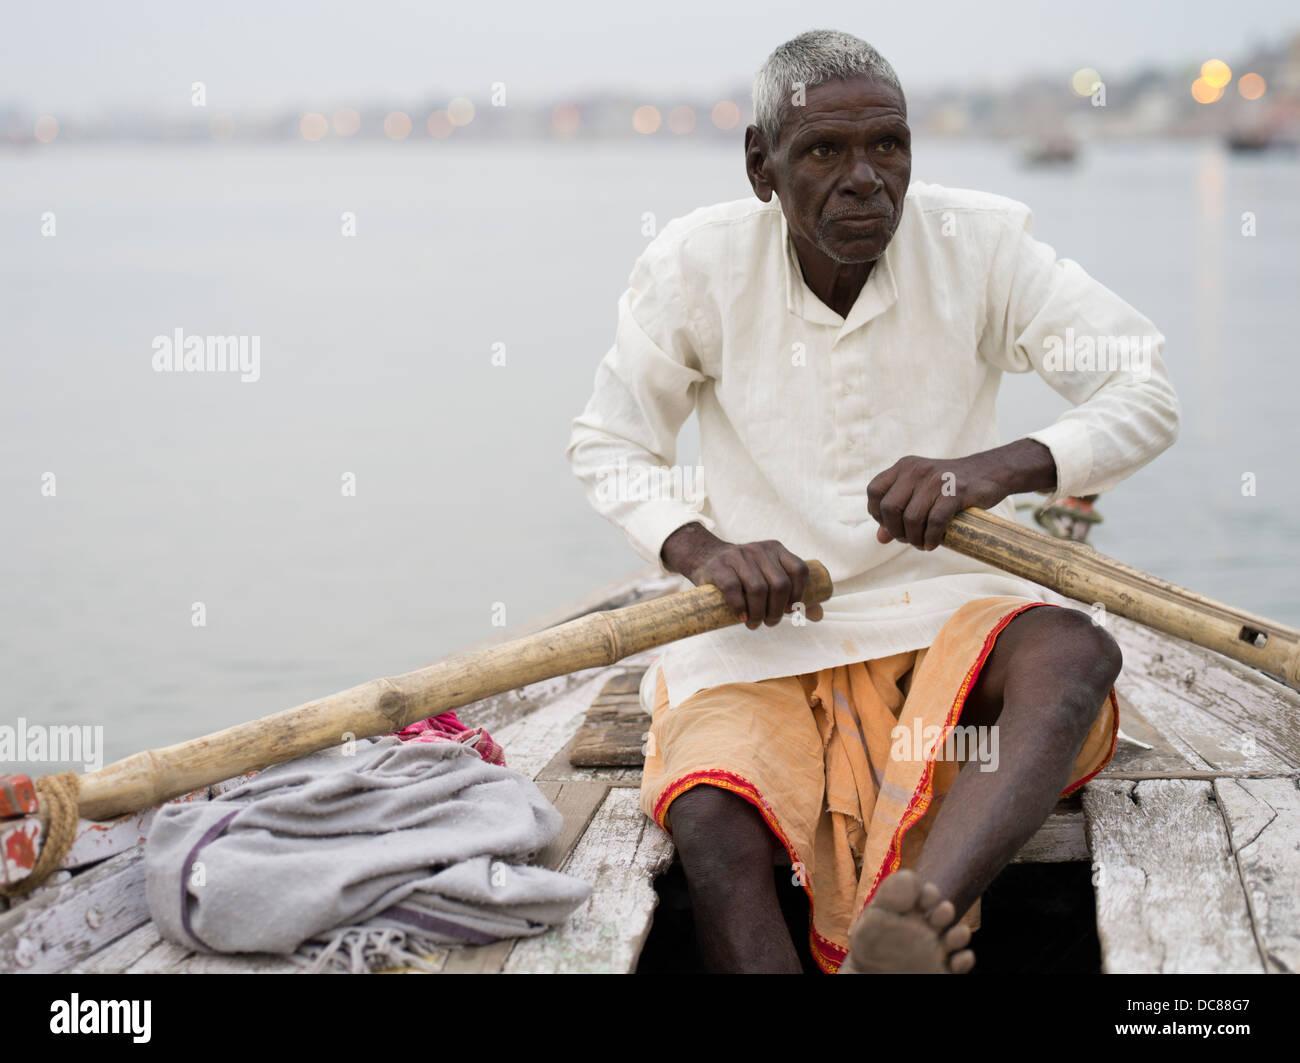 Batelier de l'aviron sur le Gange - Varanasi, Inde Photo Stock